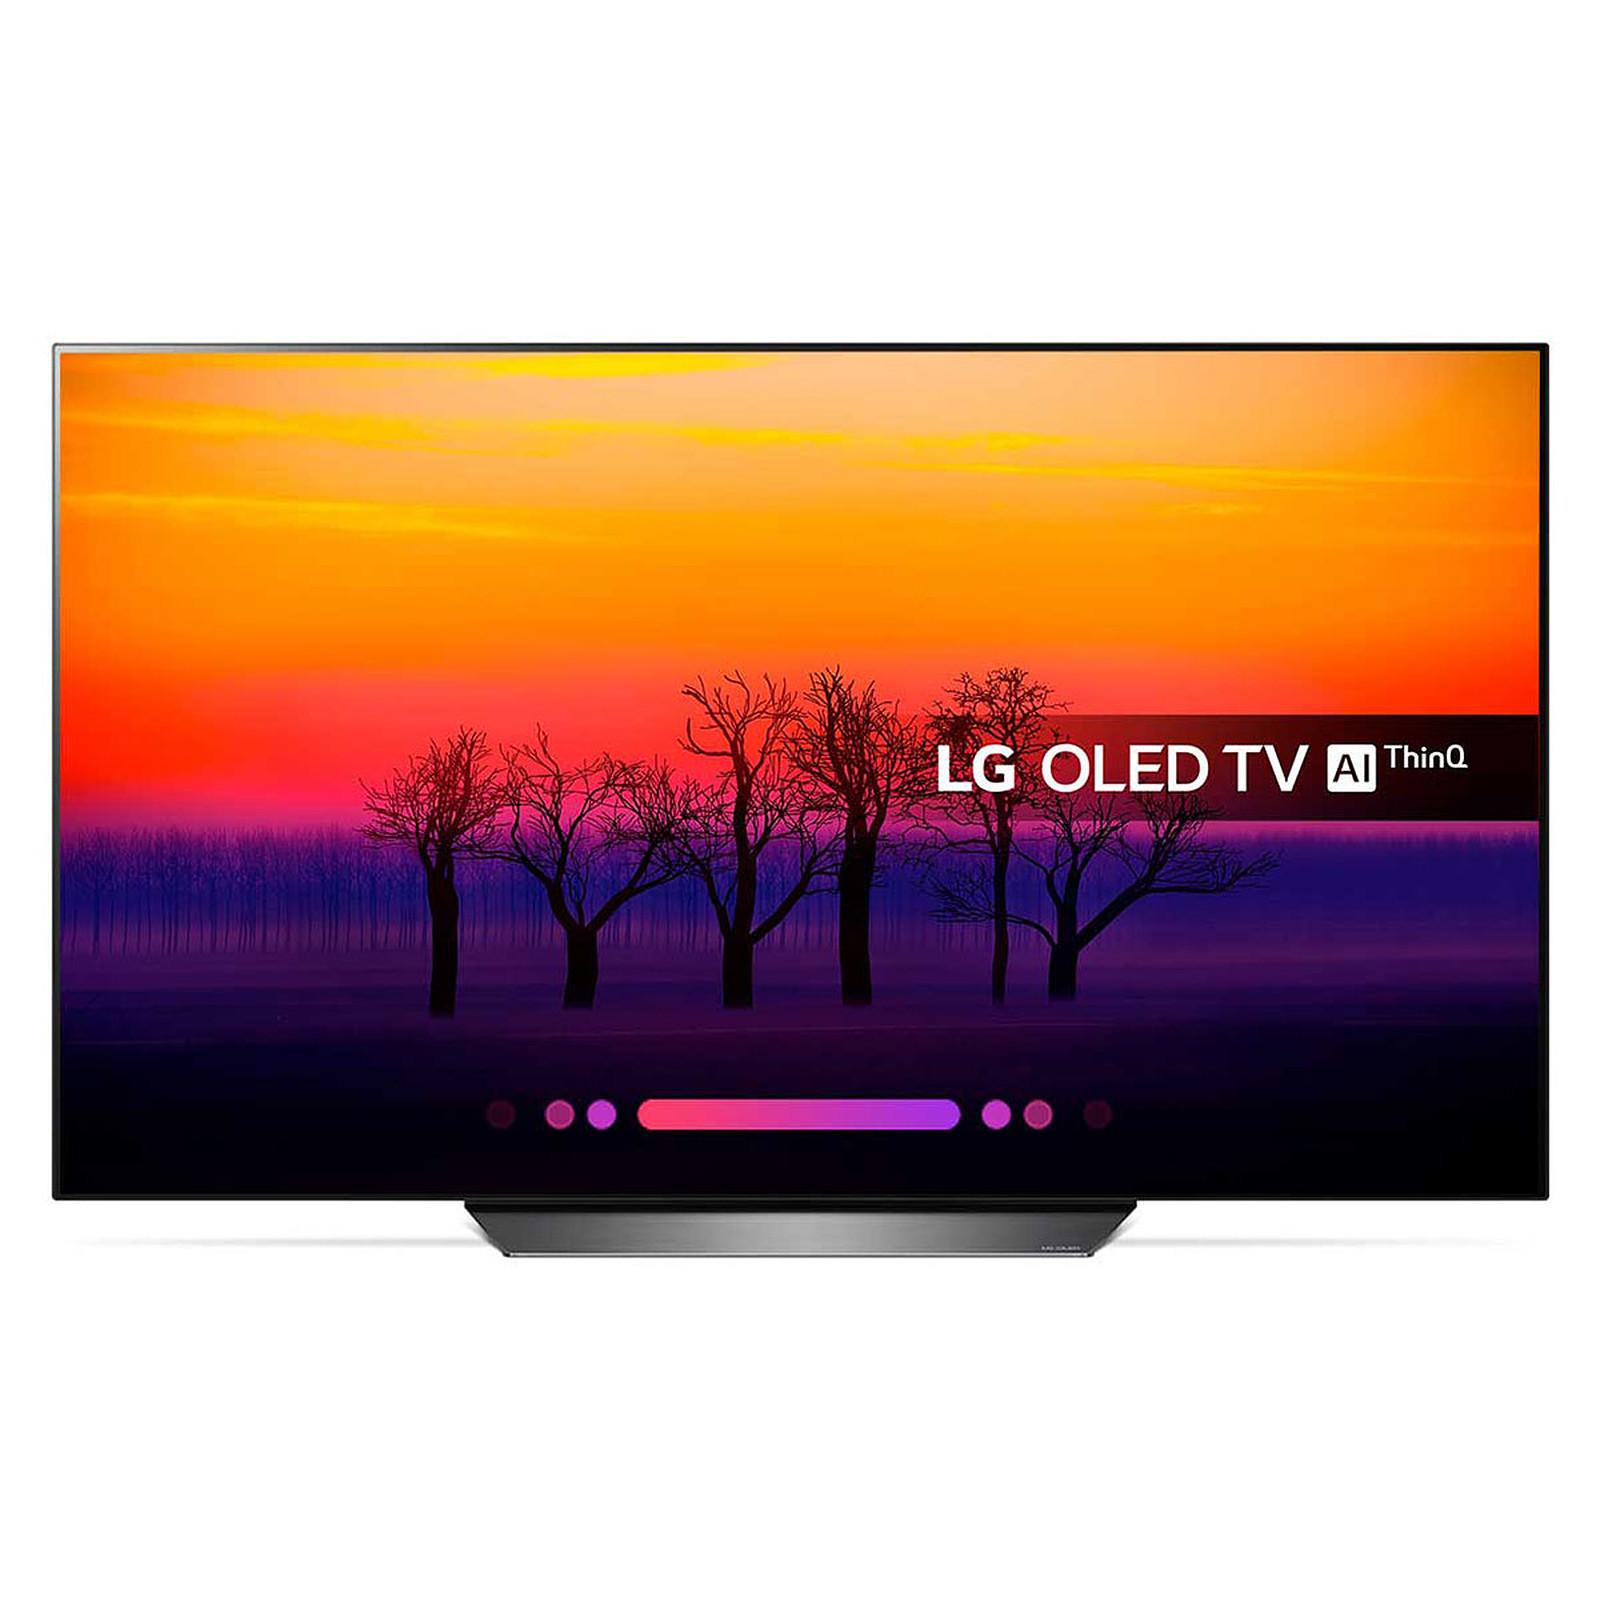 "TV 55"" LG OLED55B8 - 4K UHD, OLED, Smart TV - Menneval (27)"